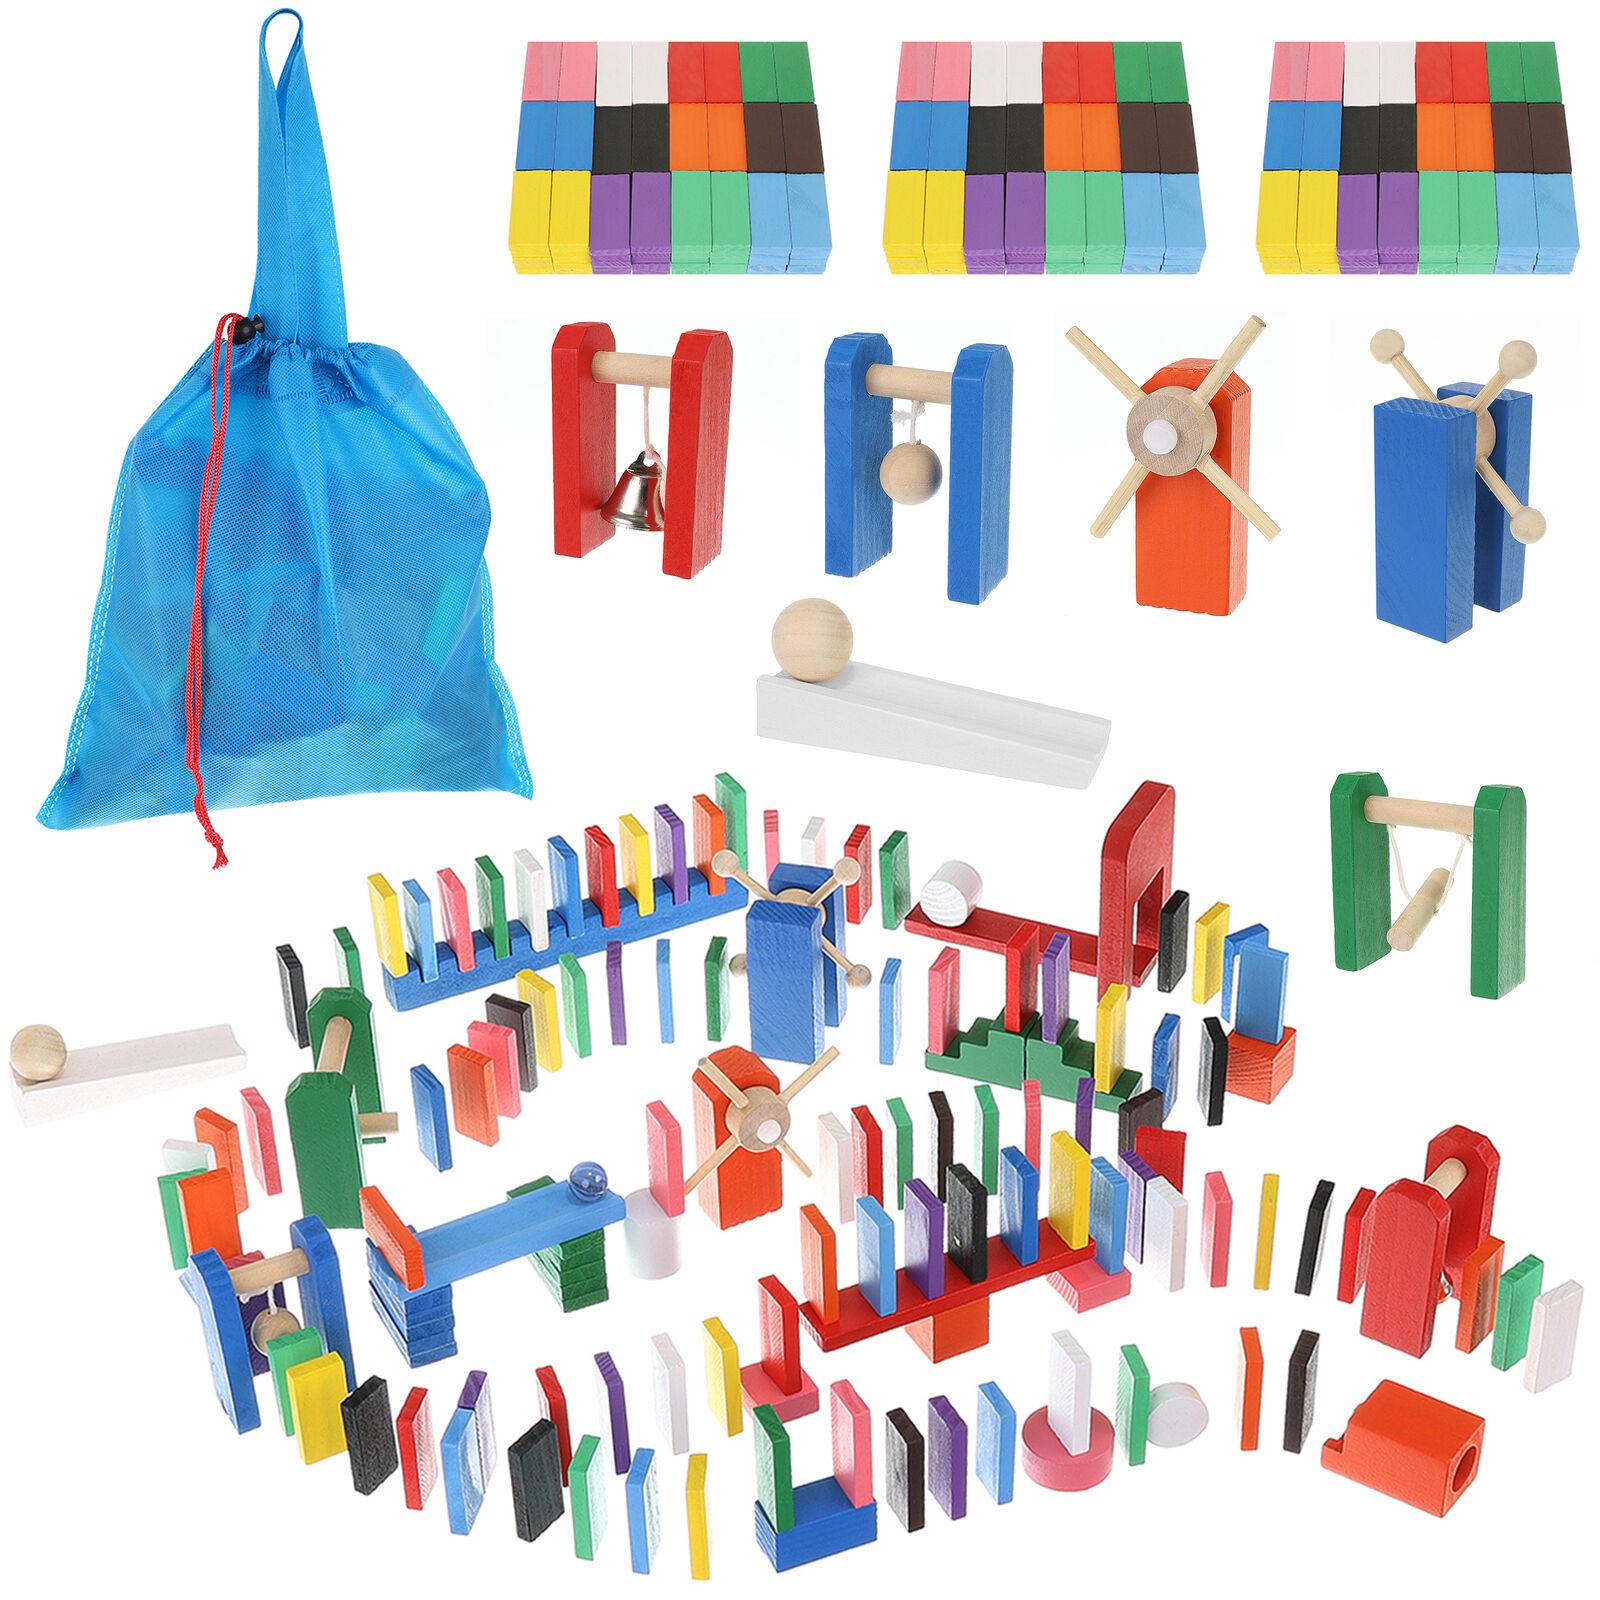 Domino Set Holz Dominosteine für Kinder Hindernisse 360-tlg 9357